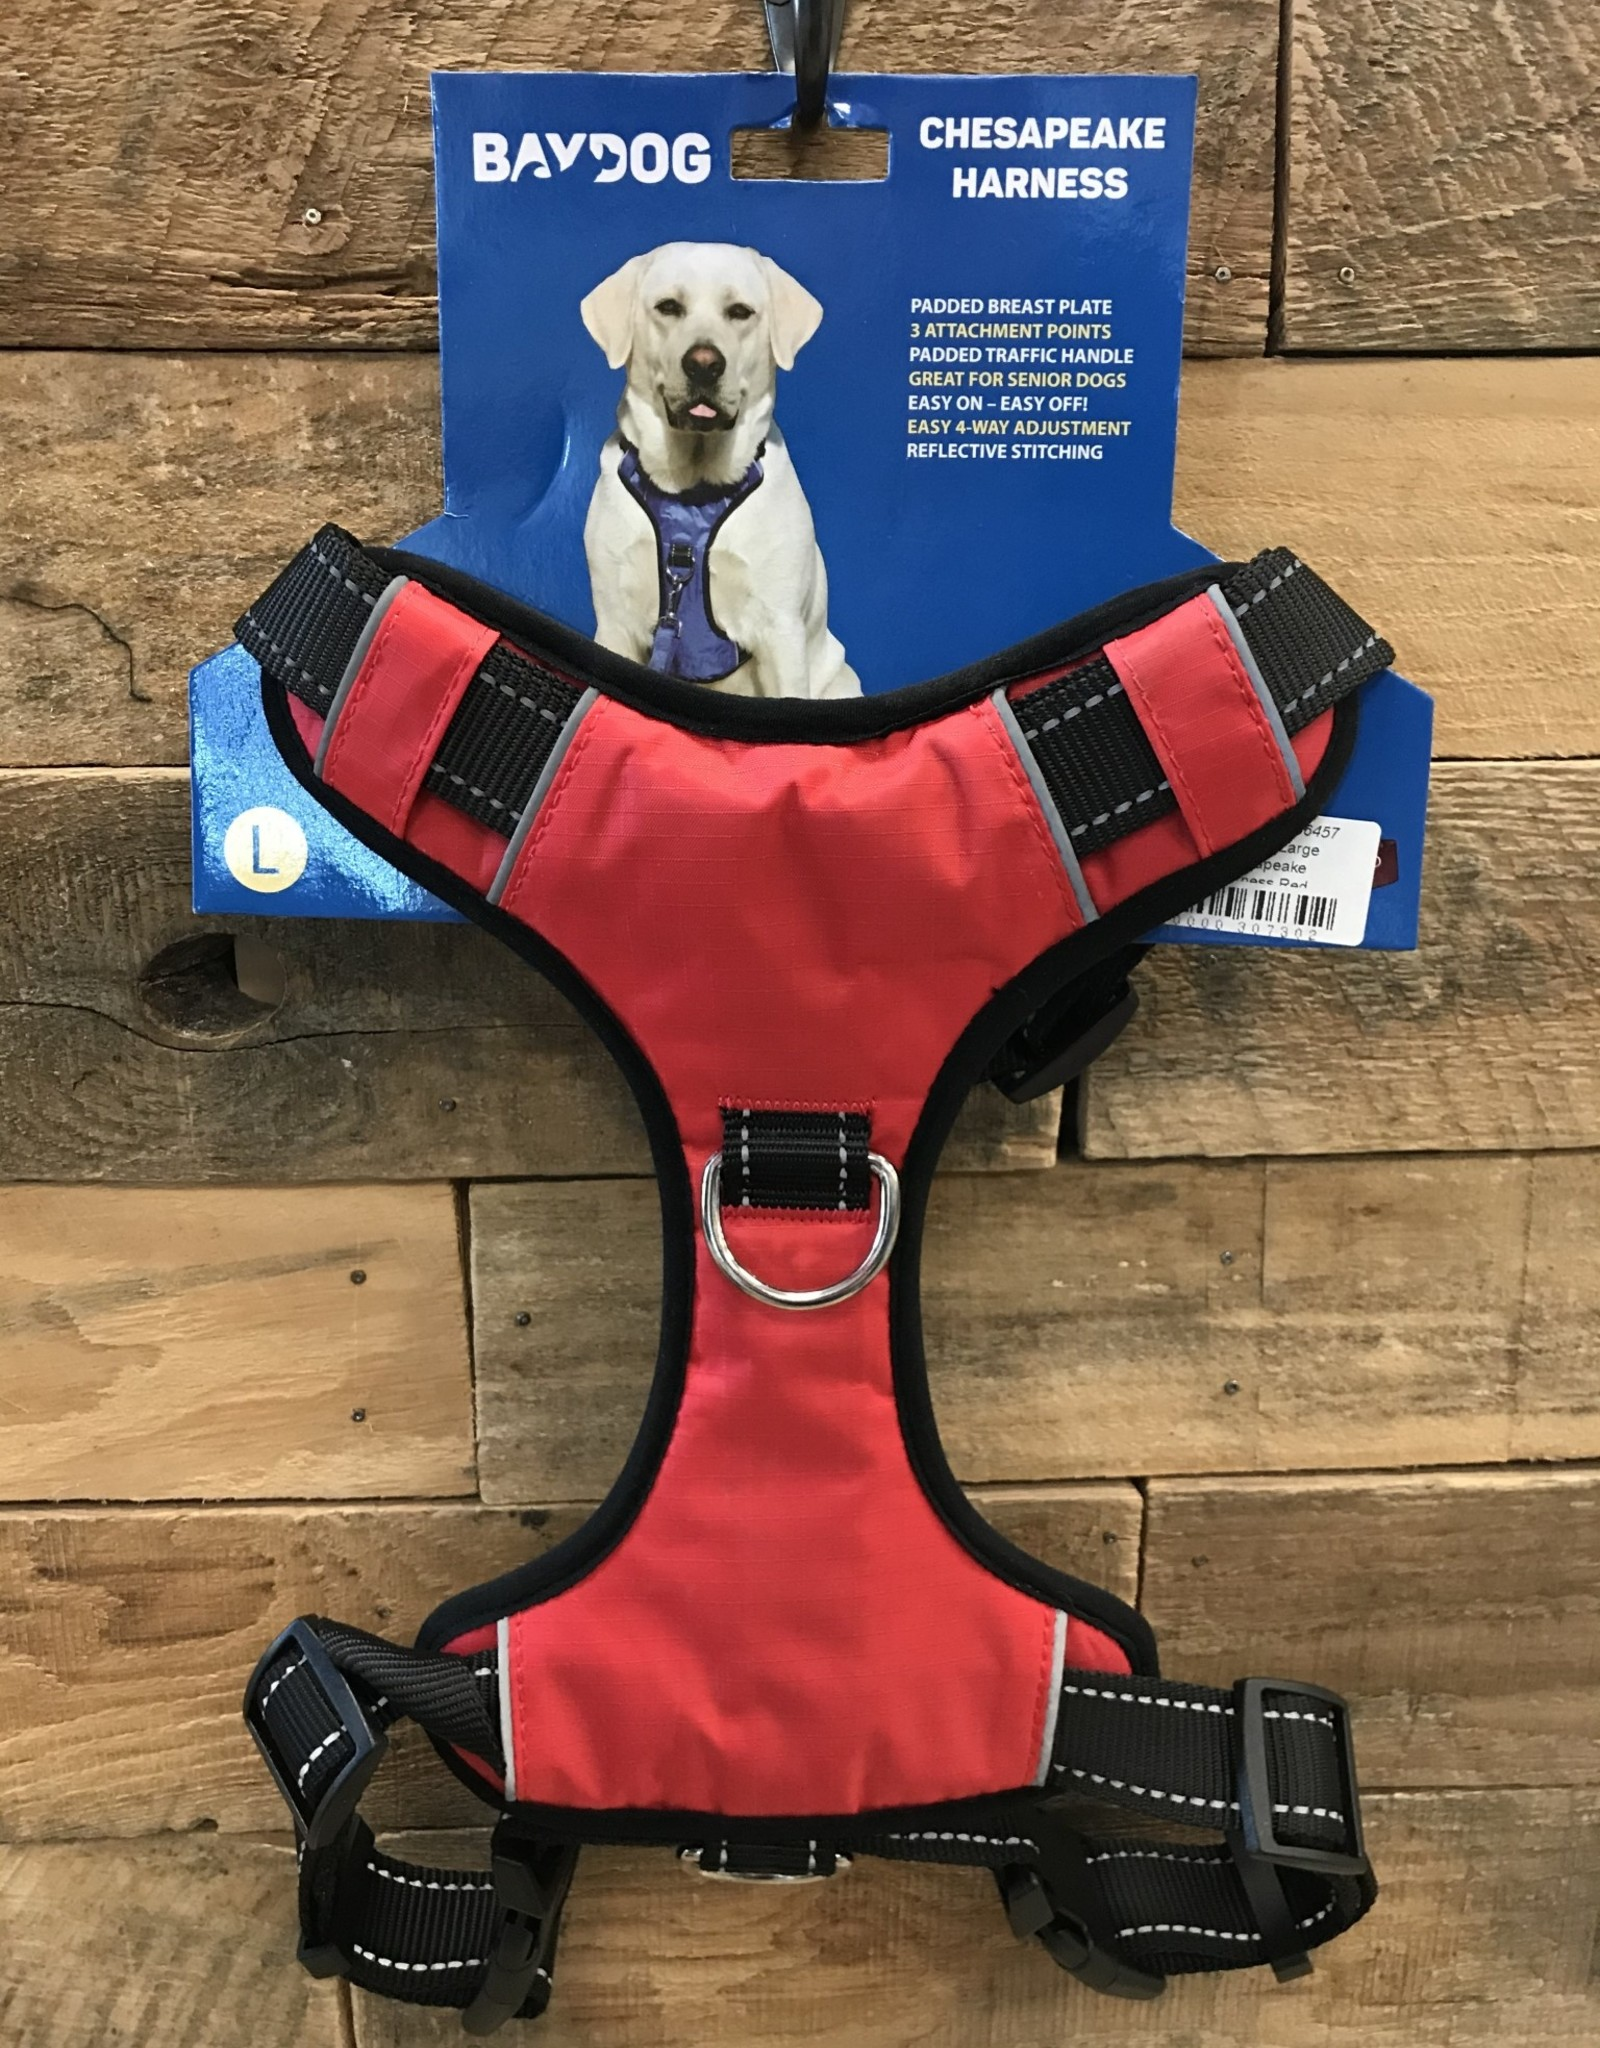 Baydog Baydog Large Chesapeake Harness